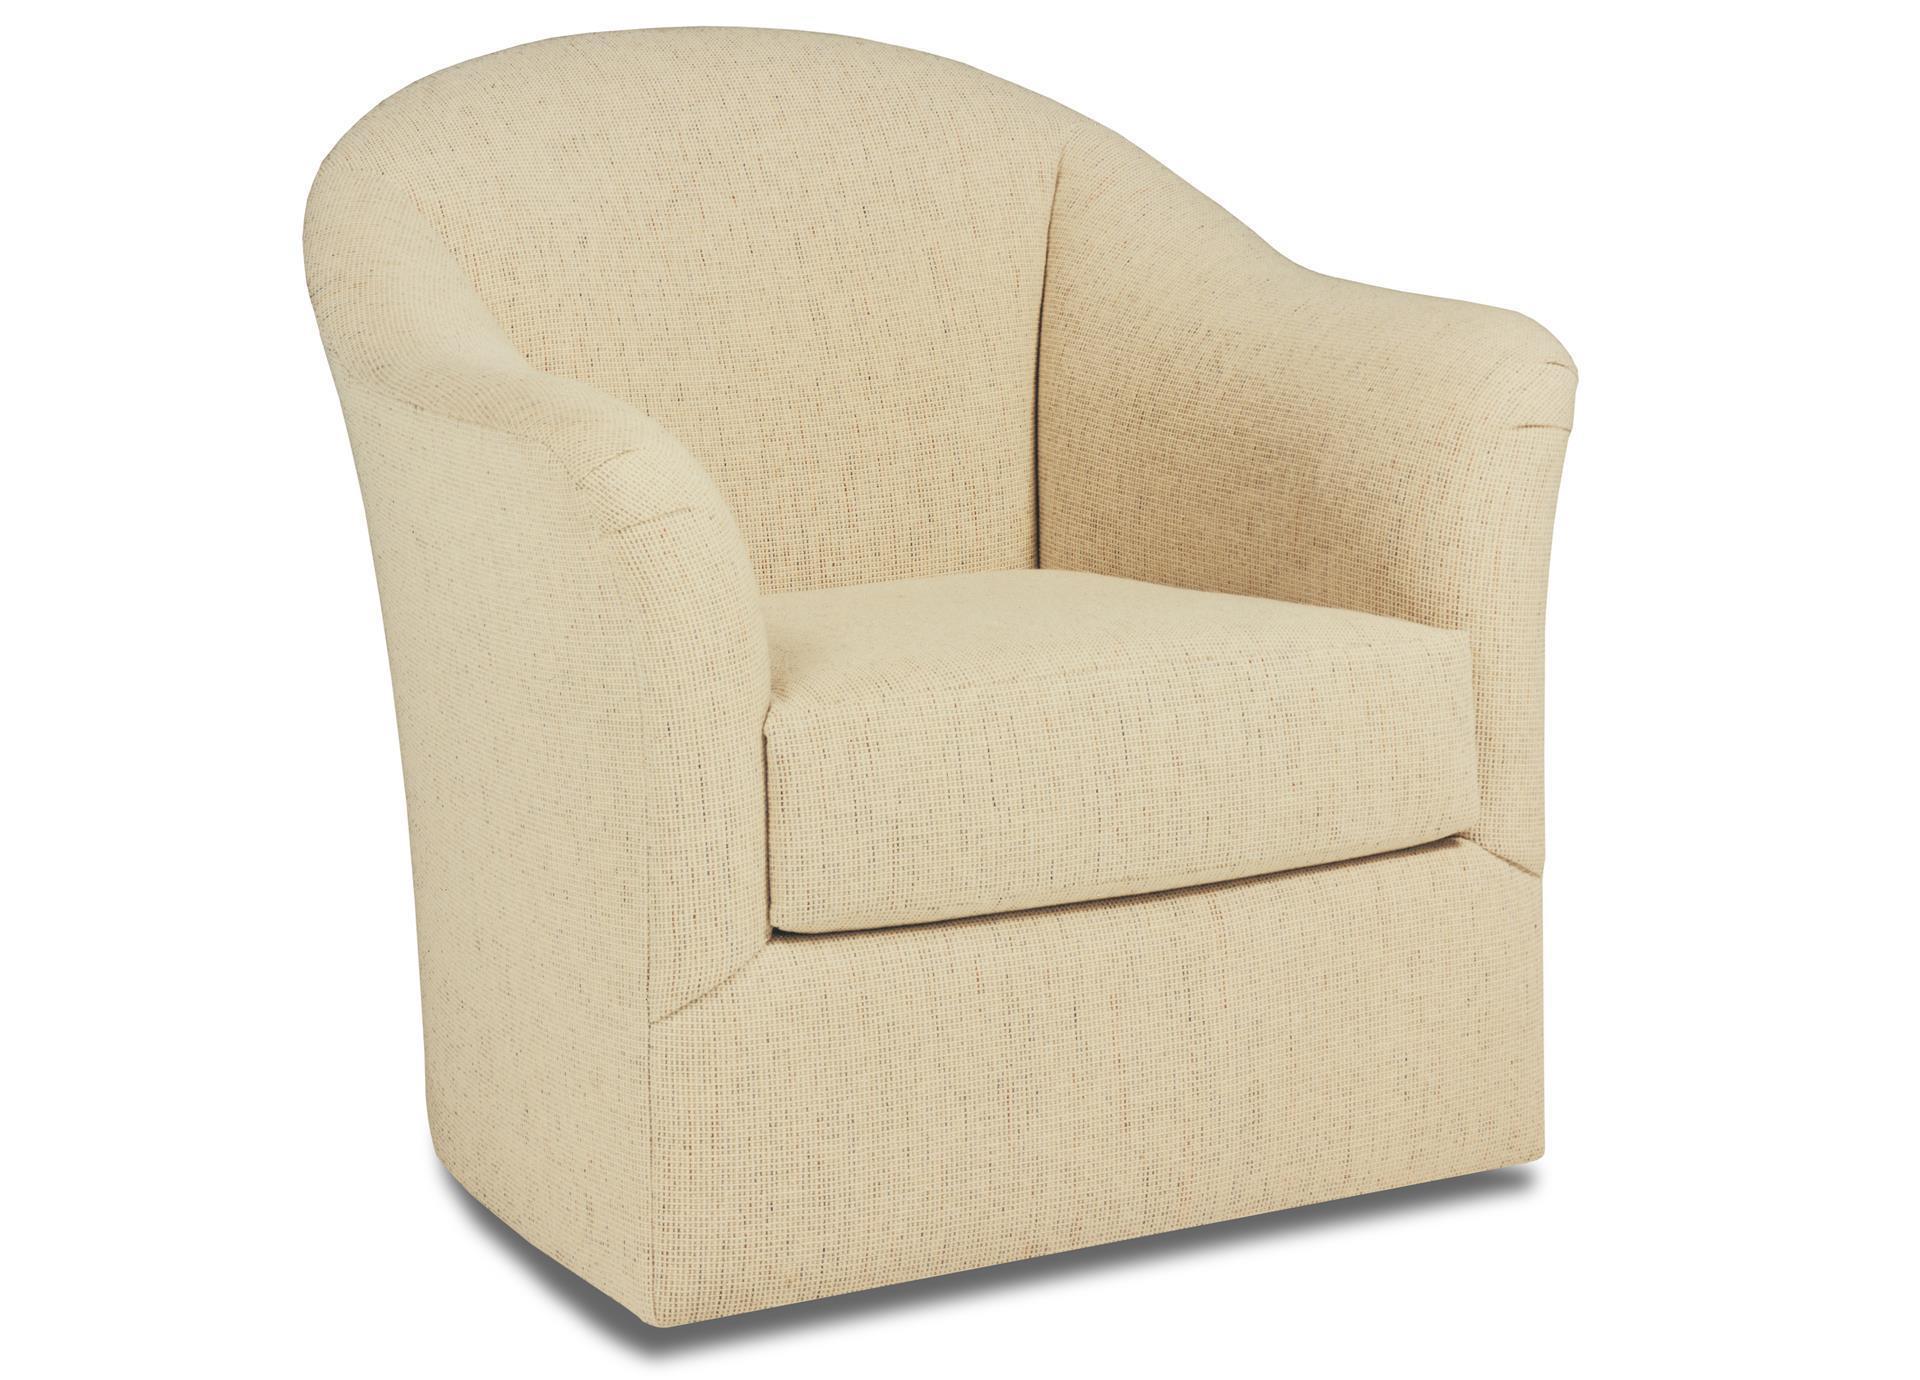 Fantastic Upholstered Riley Swivel Barrel Chair Machost Co Dining Chair Design Ideas Machostcouk